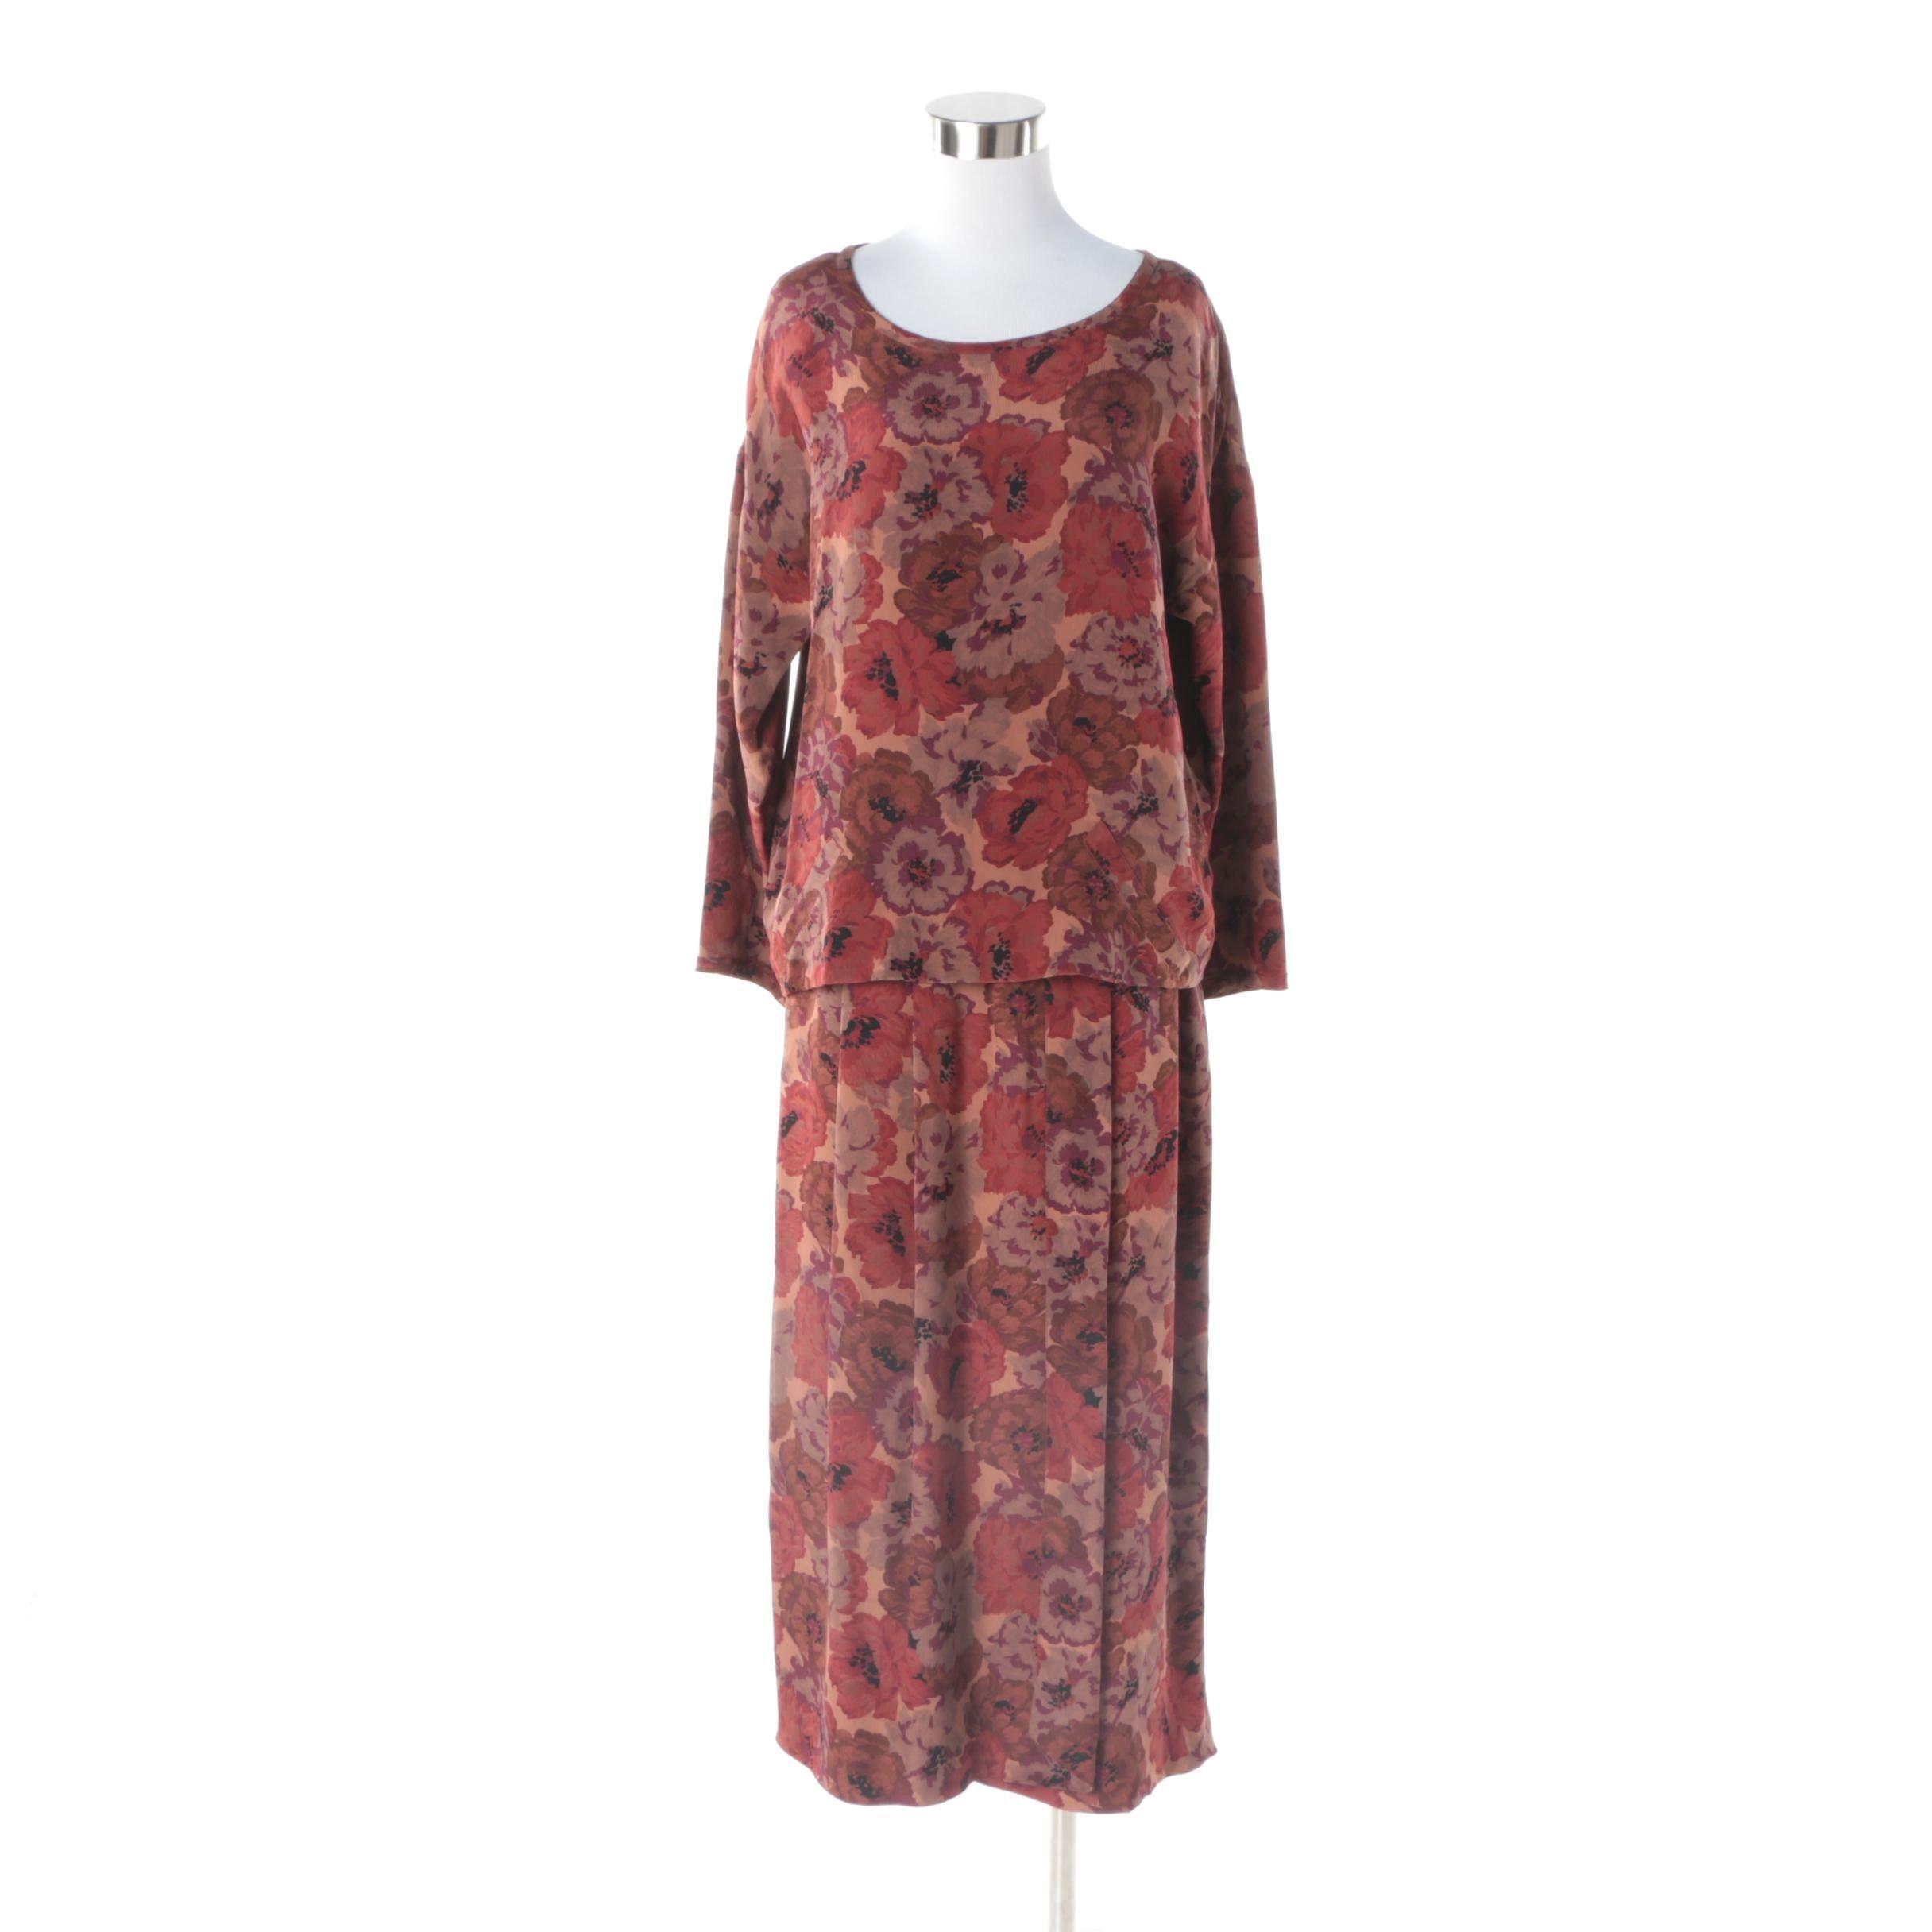 Women's 1980s Vintage Geoffrey Beene Silk Floral Print Blouse and Skirt Set